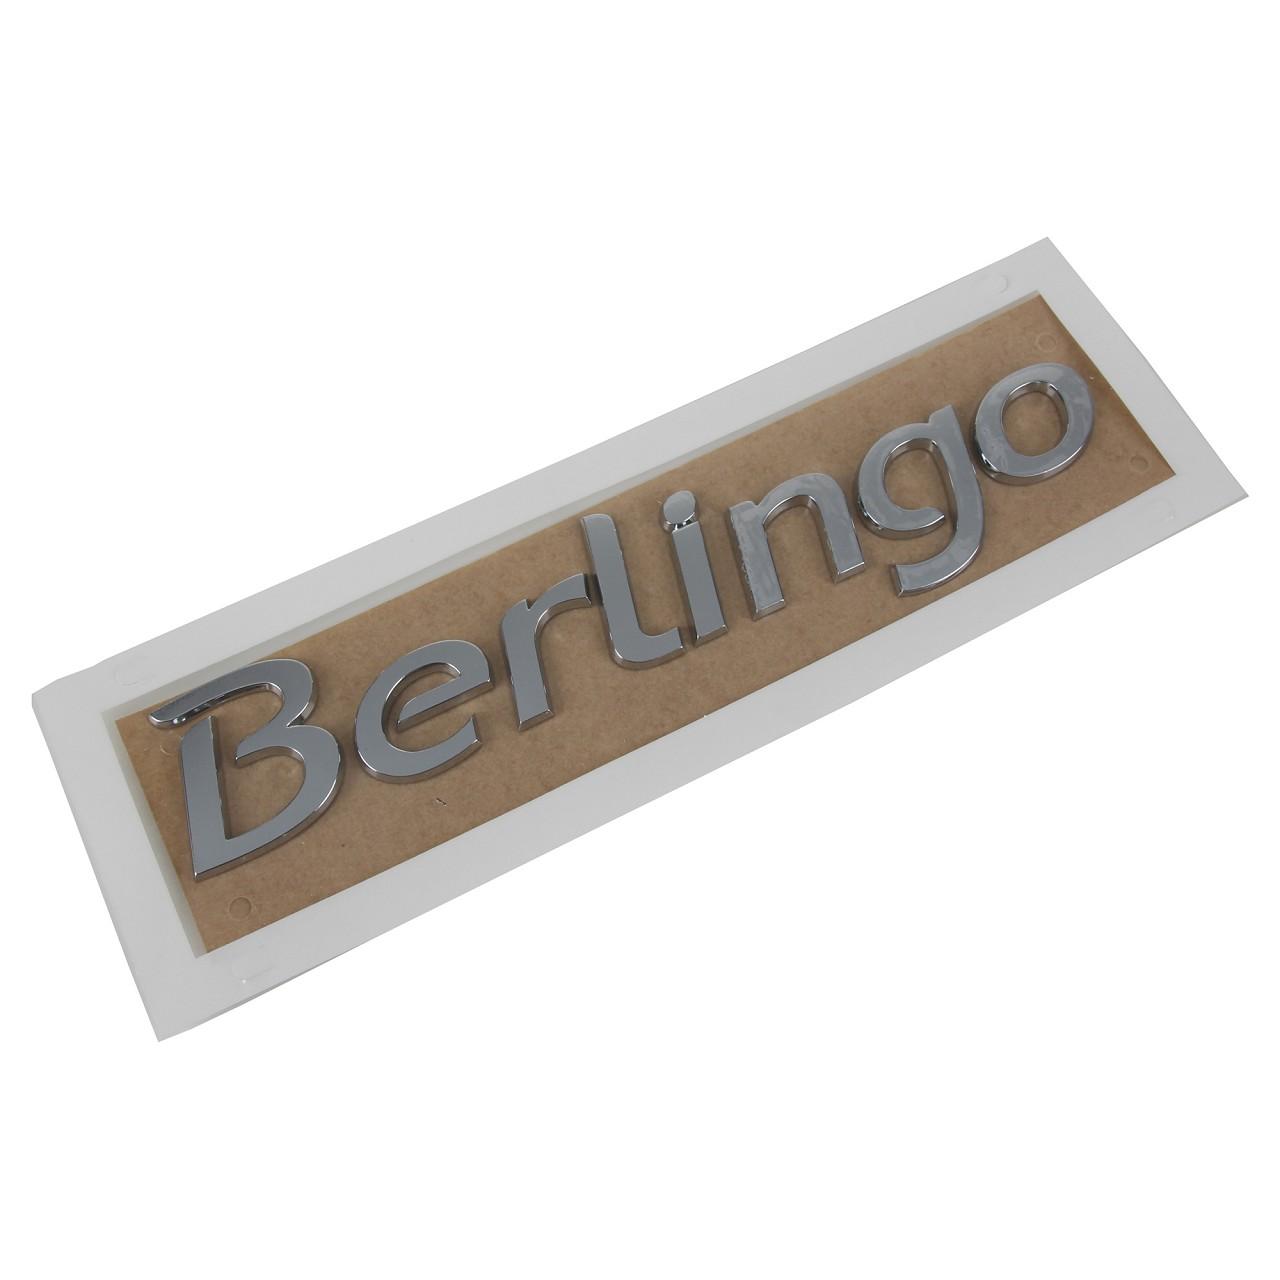 ORIGINAL Citroen Emblem Logo Schriftzug Heckklappe 8666.08 für BERLINGO